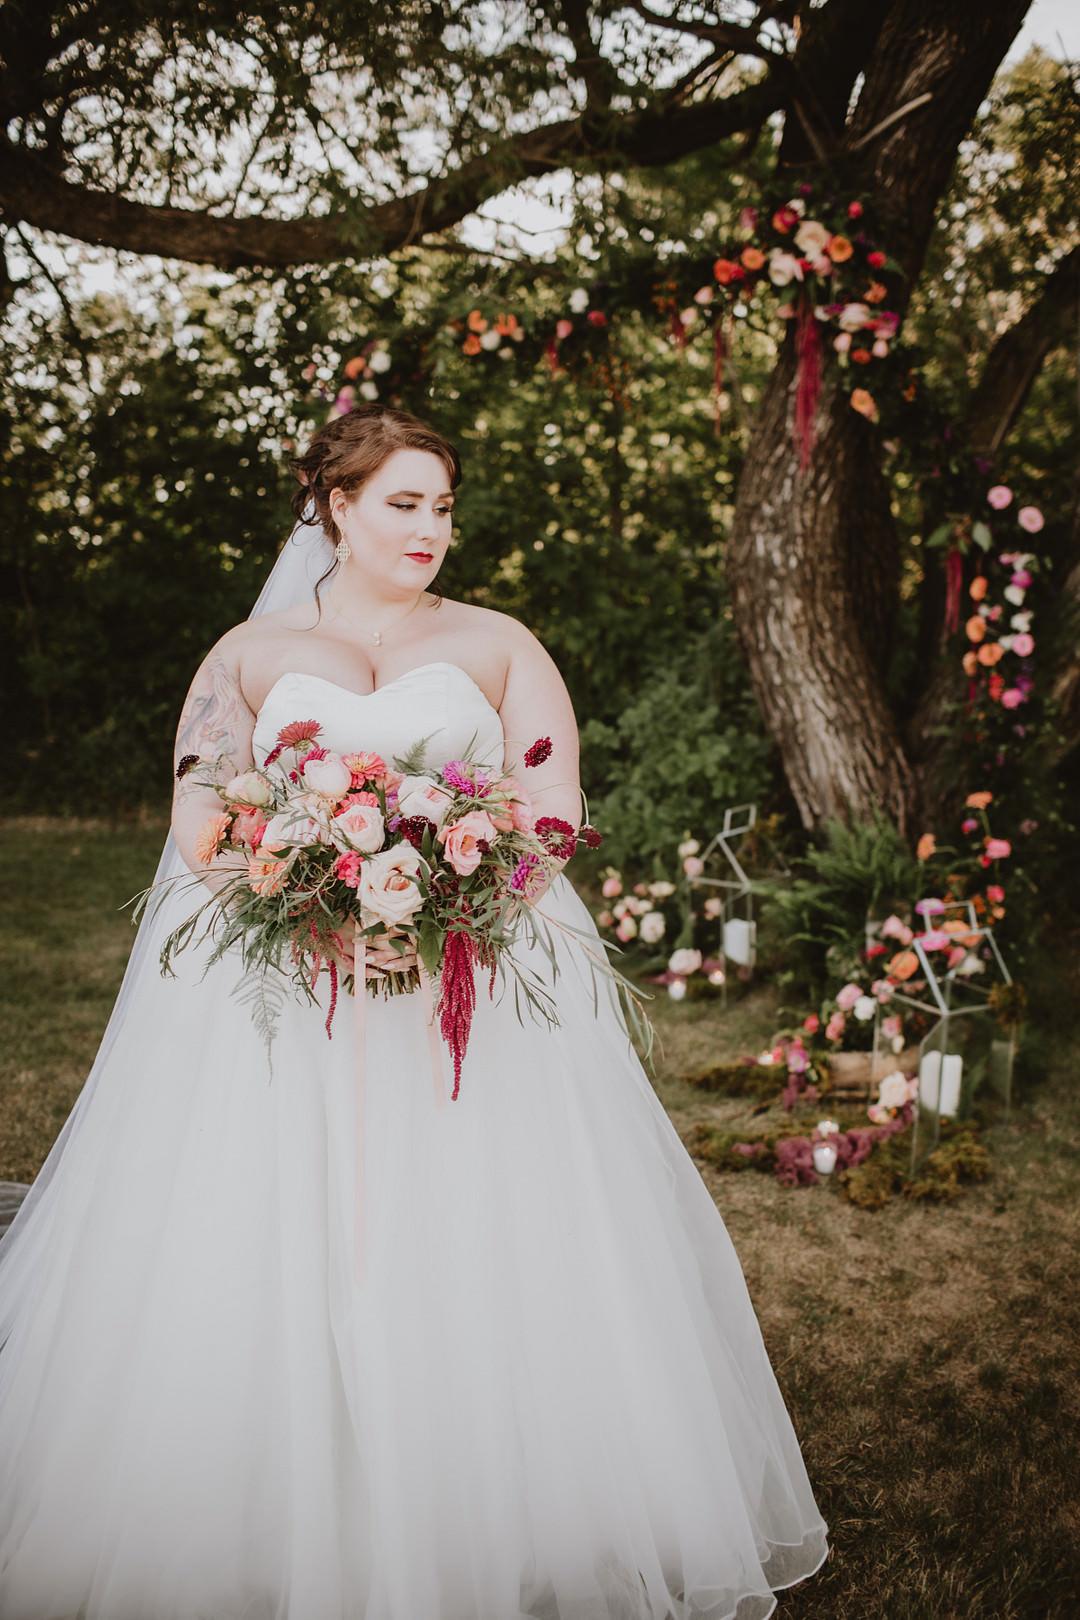 Fairytale Forest Wedding Christina W Kroeker Creative Flower Installation Floral Tree Candle Decor